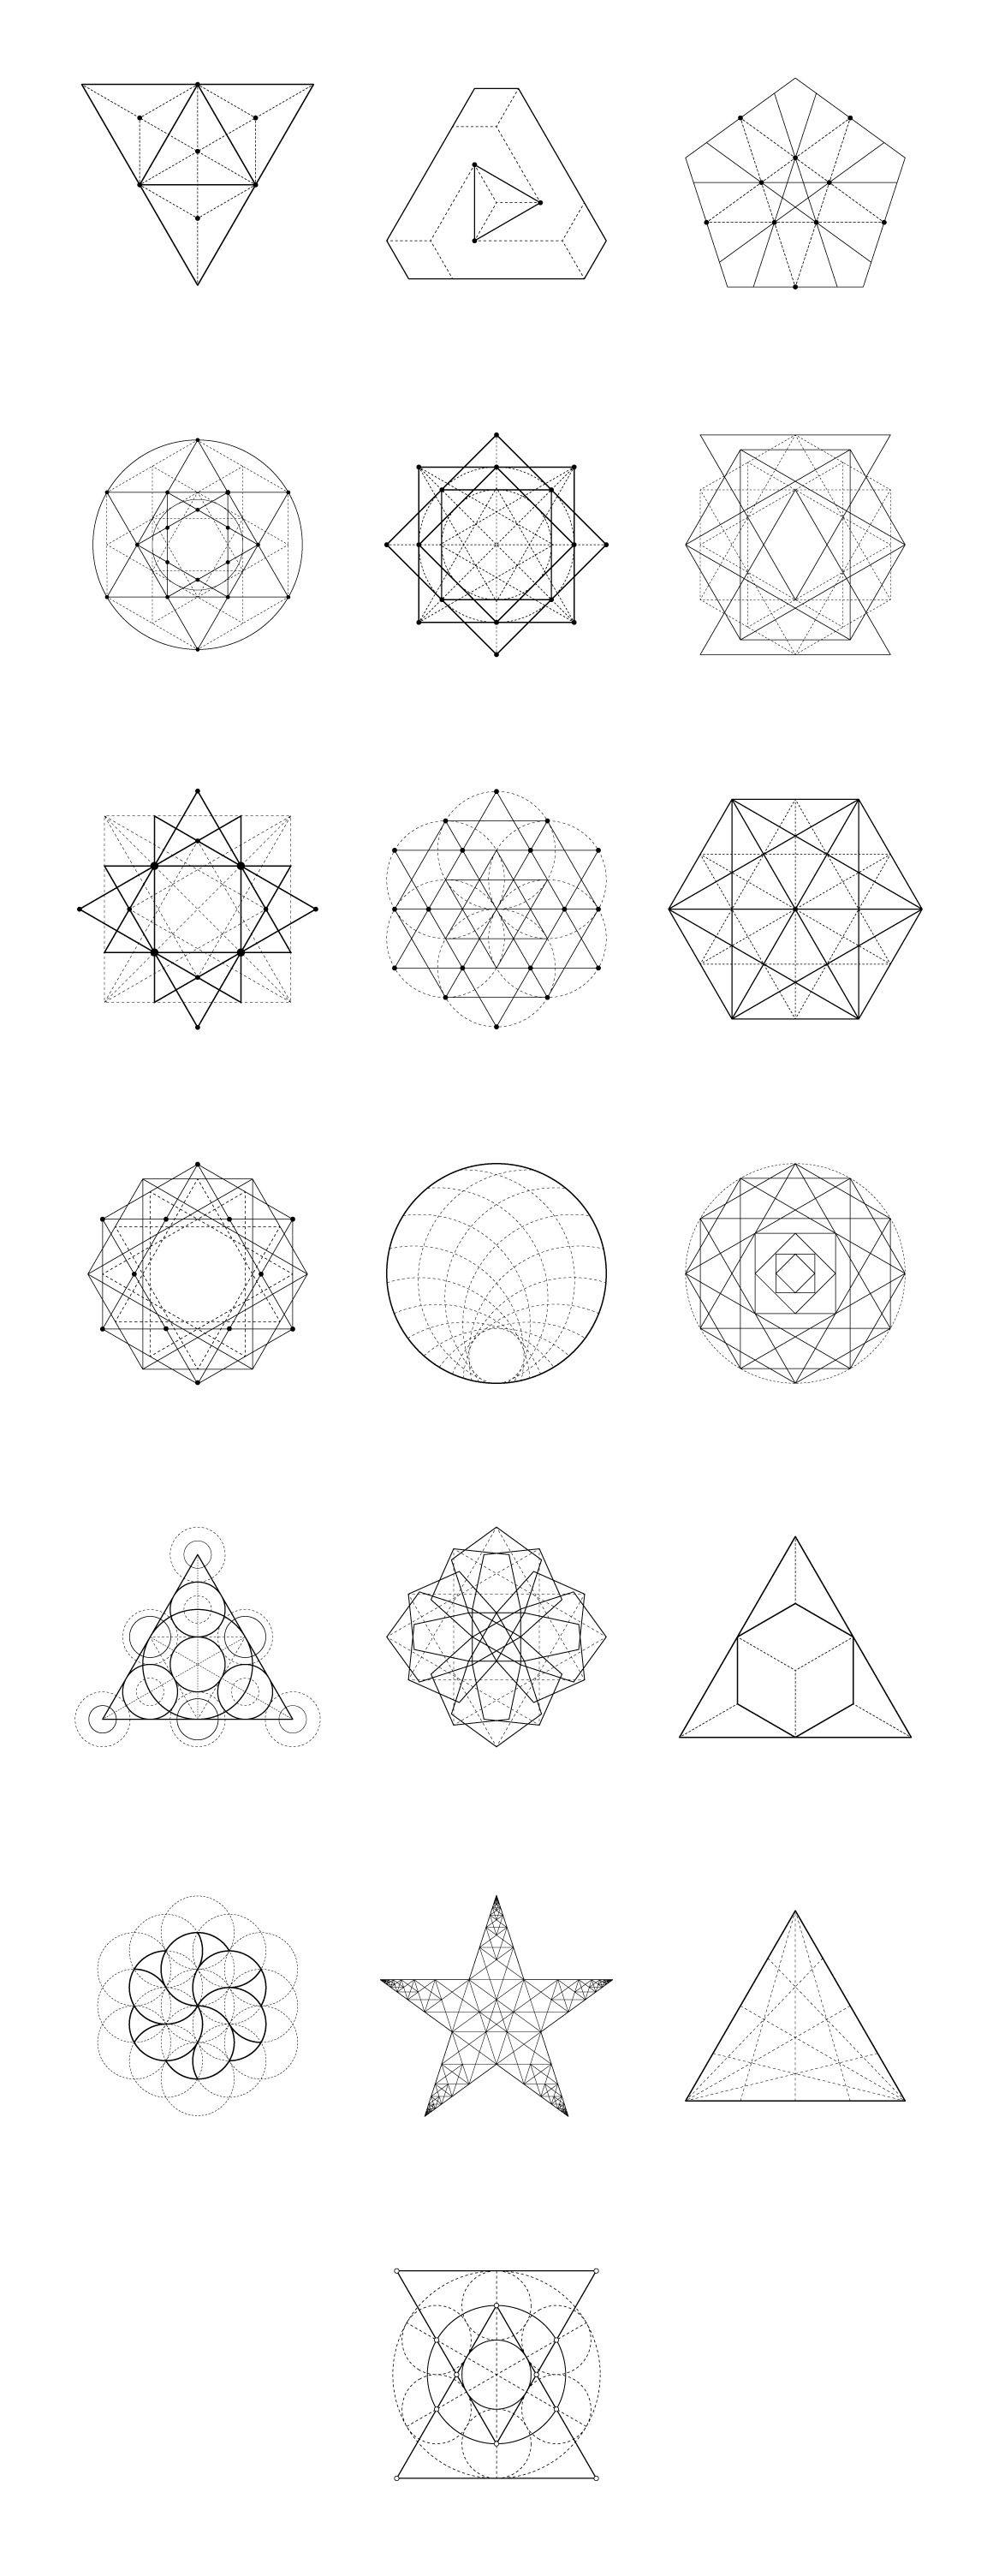 40 mysterious sacred geometry tattoo designs - Sacred Geometry Bundle 60 Items